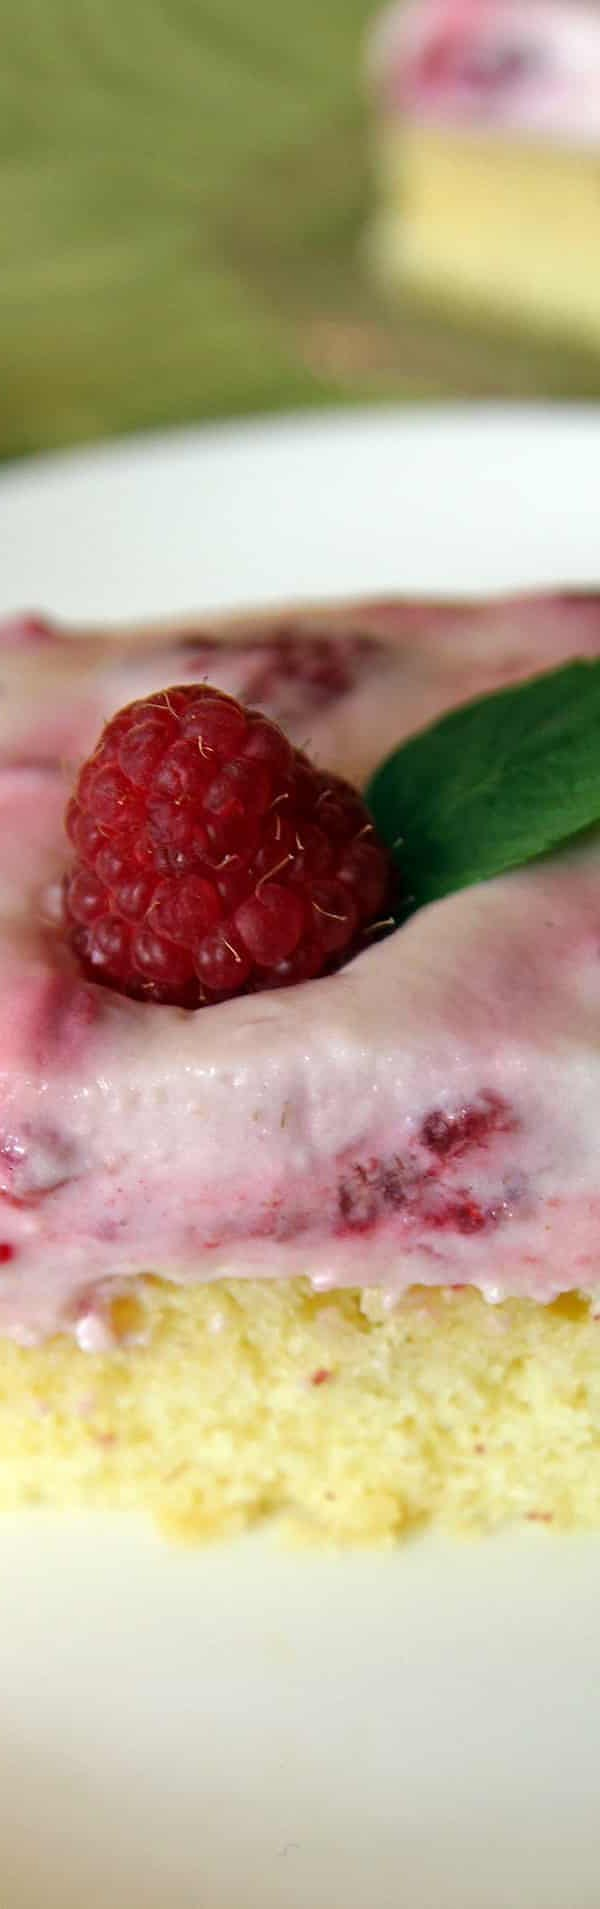 Cake Bar with Raspberry Icing